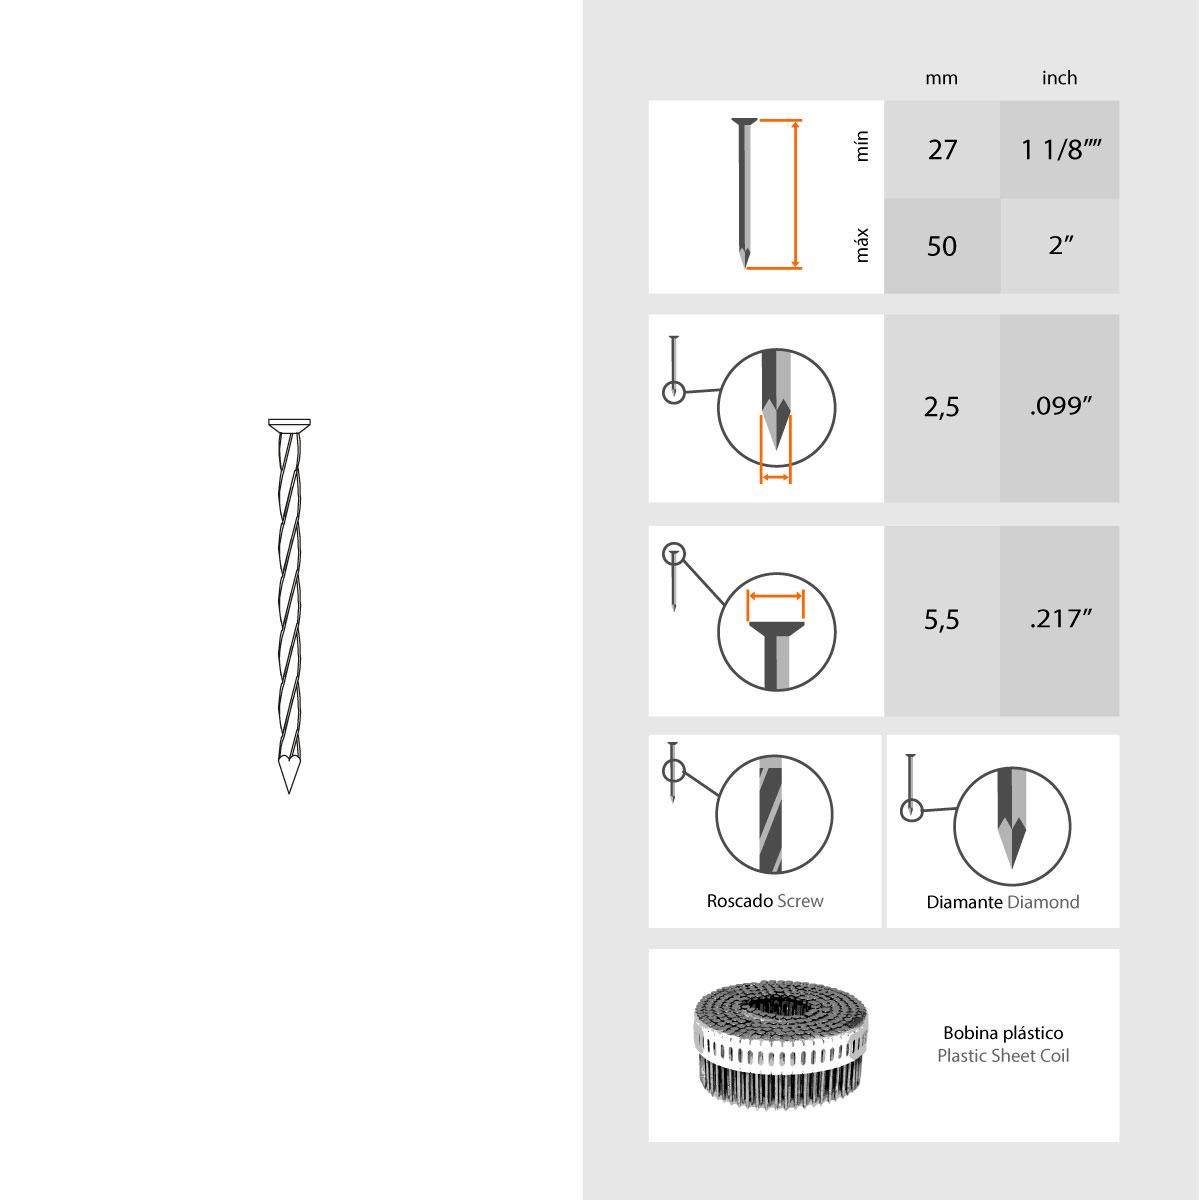 Clavo en bobina de acero FAP (unión plástico)